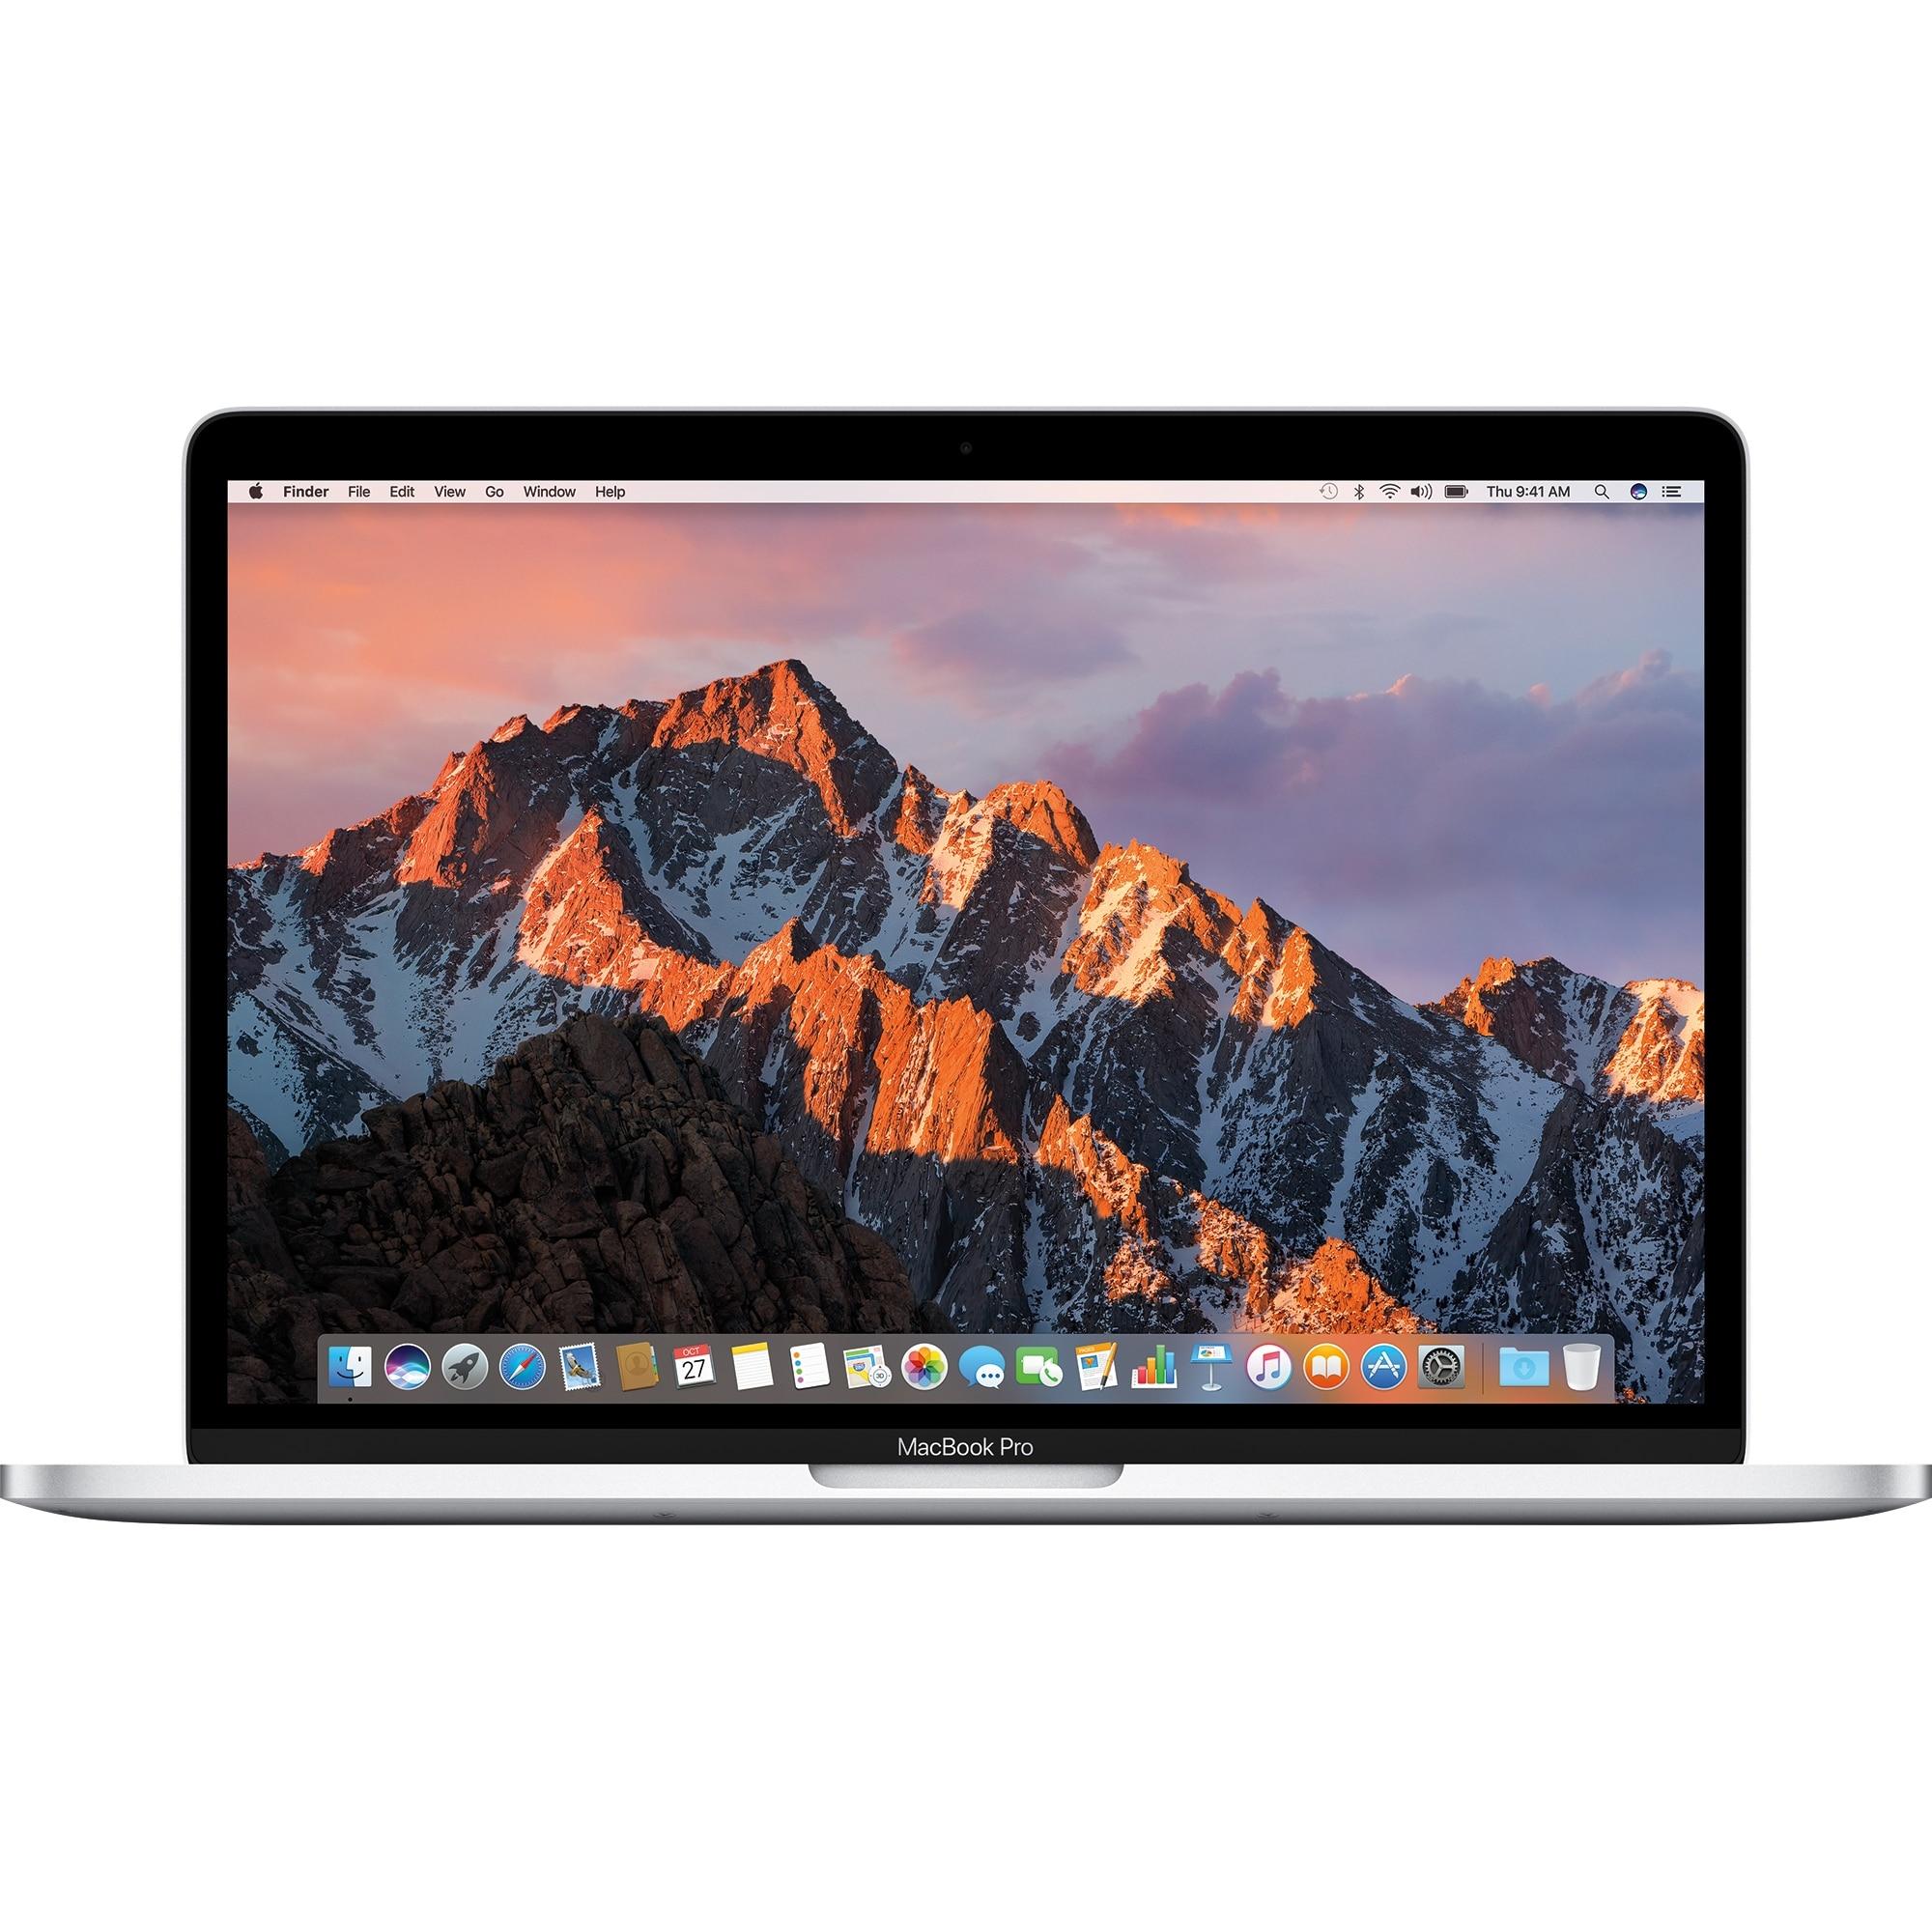 "Fotografie Laptop Apple MacBook Pro 13 cu procesor Intel® Dual Core™ i5 2.30GHz, 13.3"", Ecran Retina, 8GB, 128GB SSD, Intel® Iris Plus Graphics 640, macOS Sierra, INT KB, Silver"